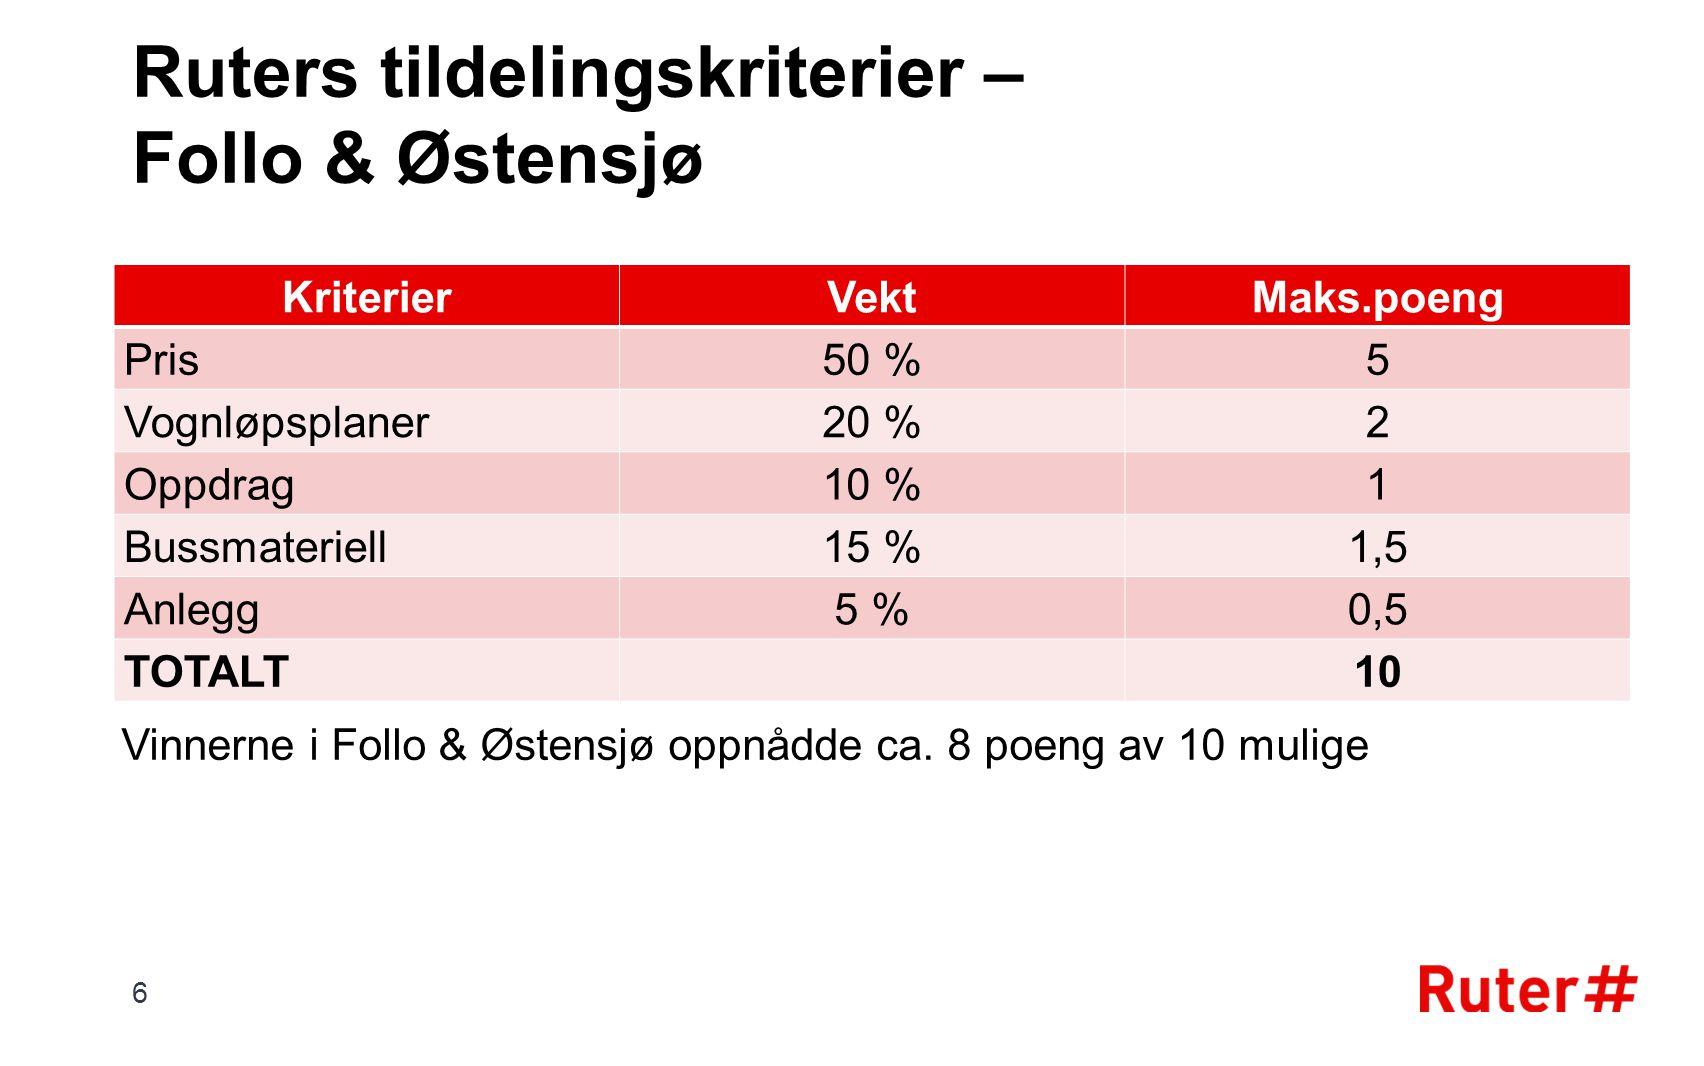 Ruters tildelingskriterier – Follo & Østensjø